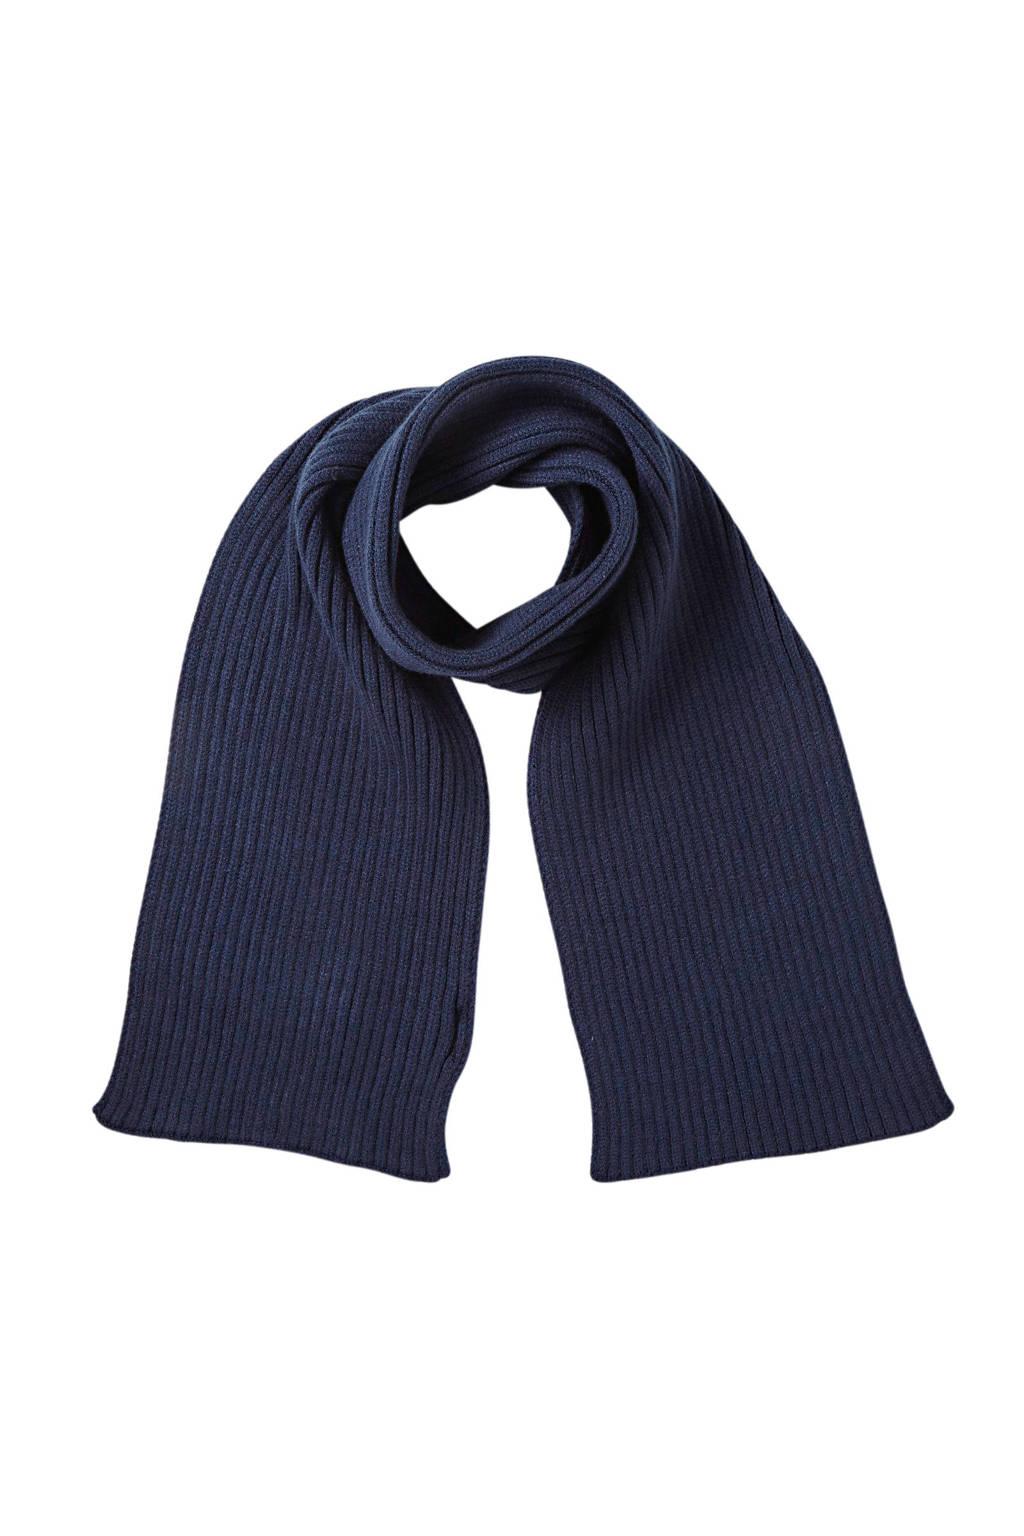 Sarlini gebreide sjaal donkerblauw, Donkerblauw